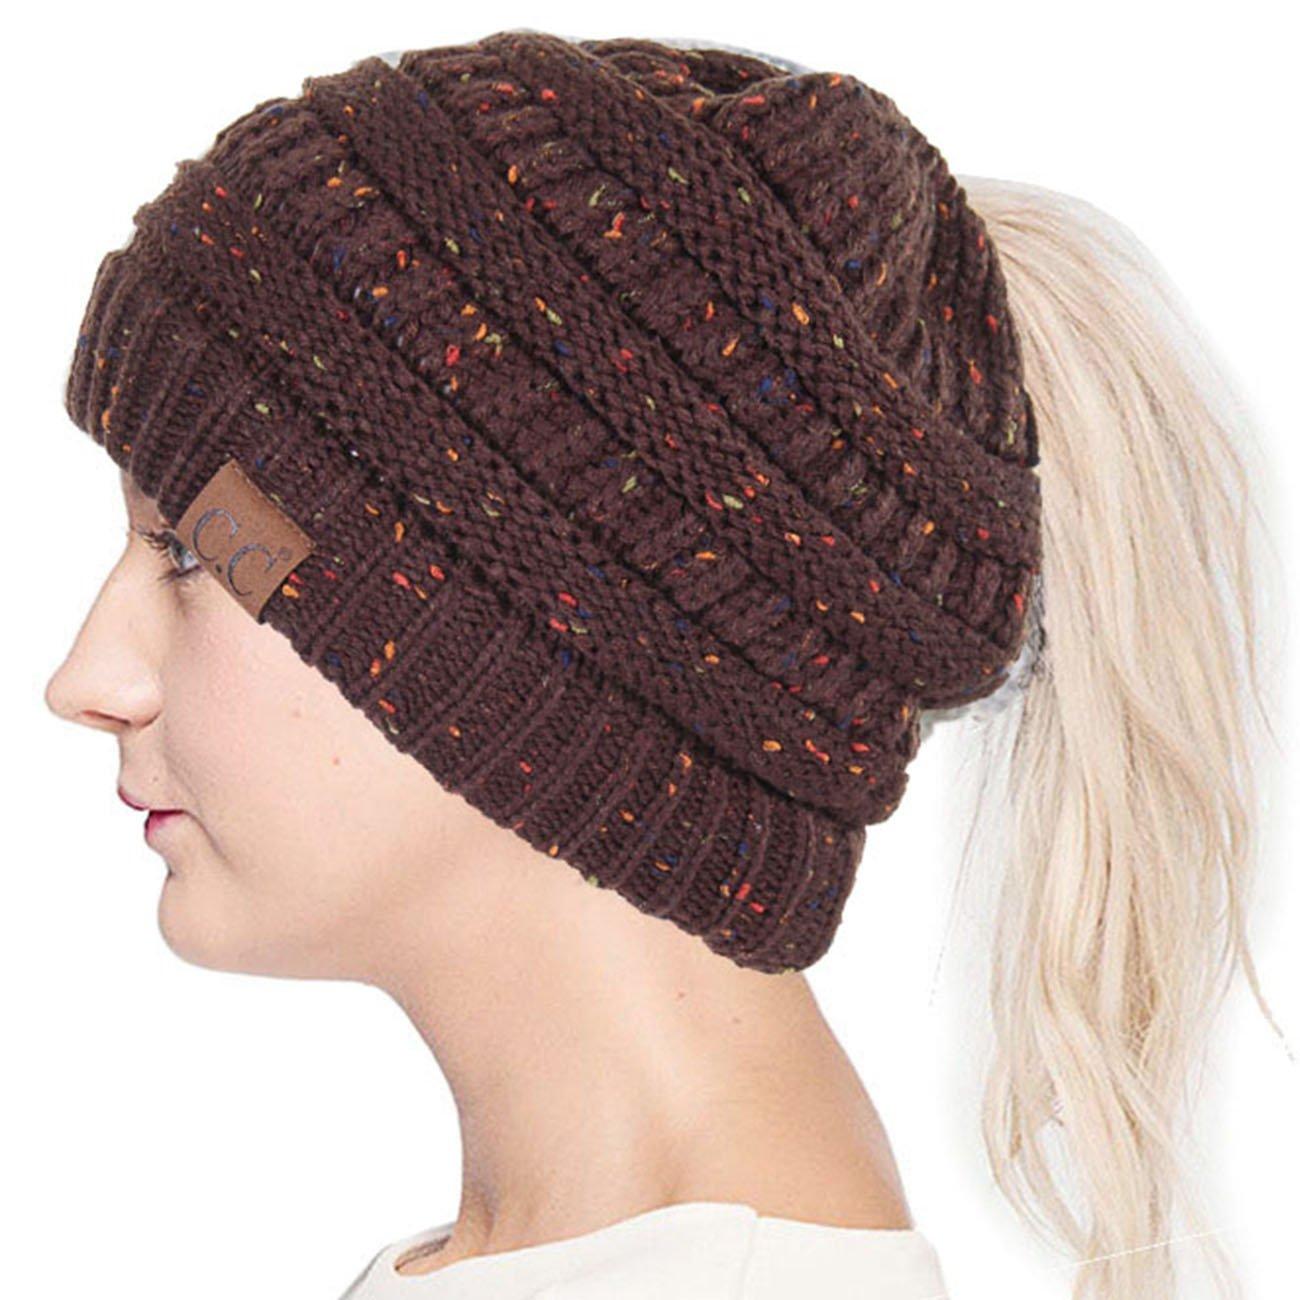 ScarvesMe C.C Confetti BeanieTail Ponytail Messy Bun Solid Ribbed Beanie Hat Cap (Brown)